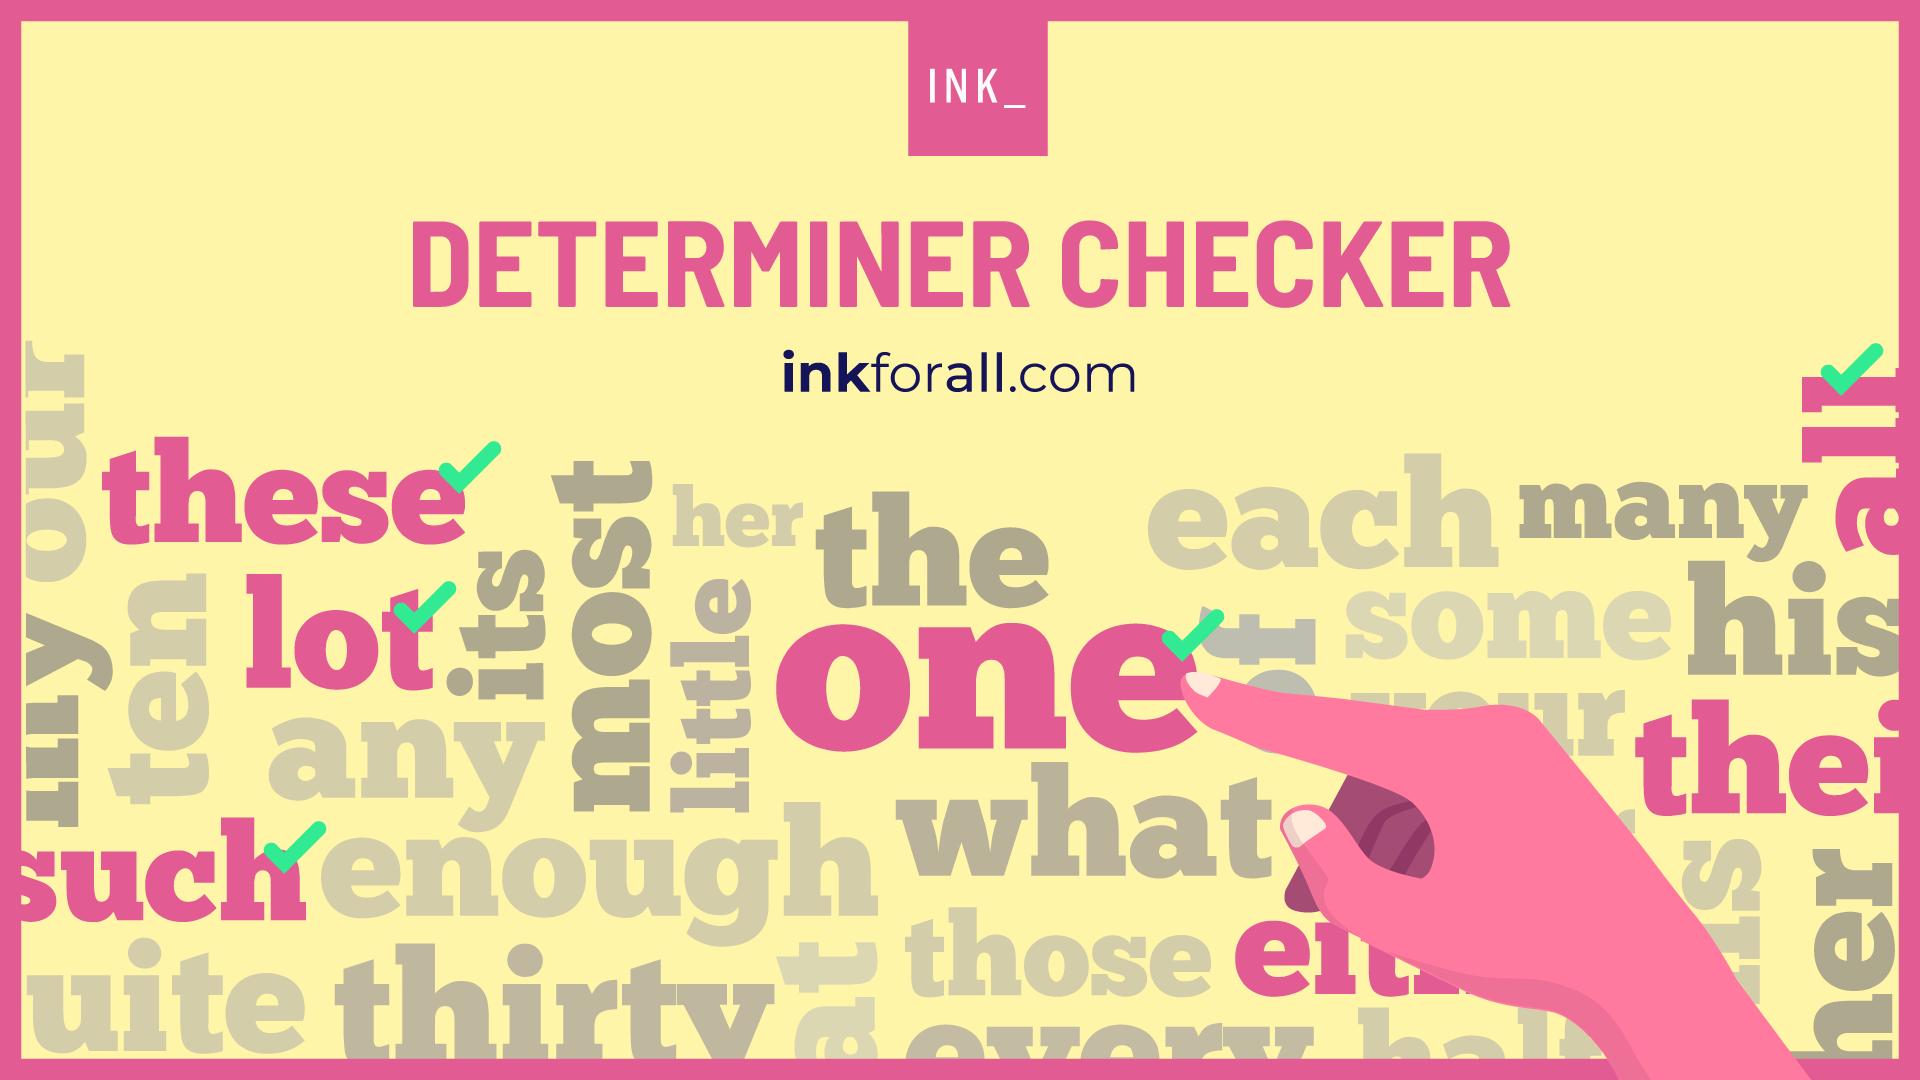 Determiner checker